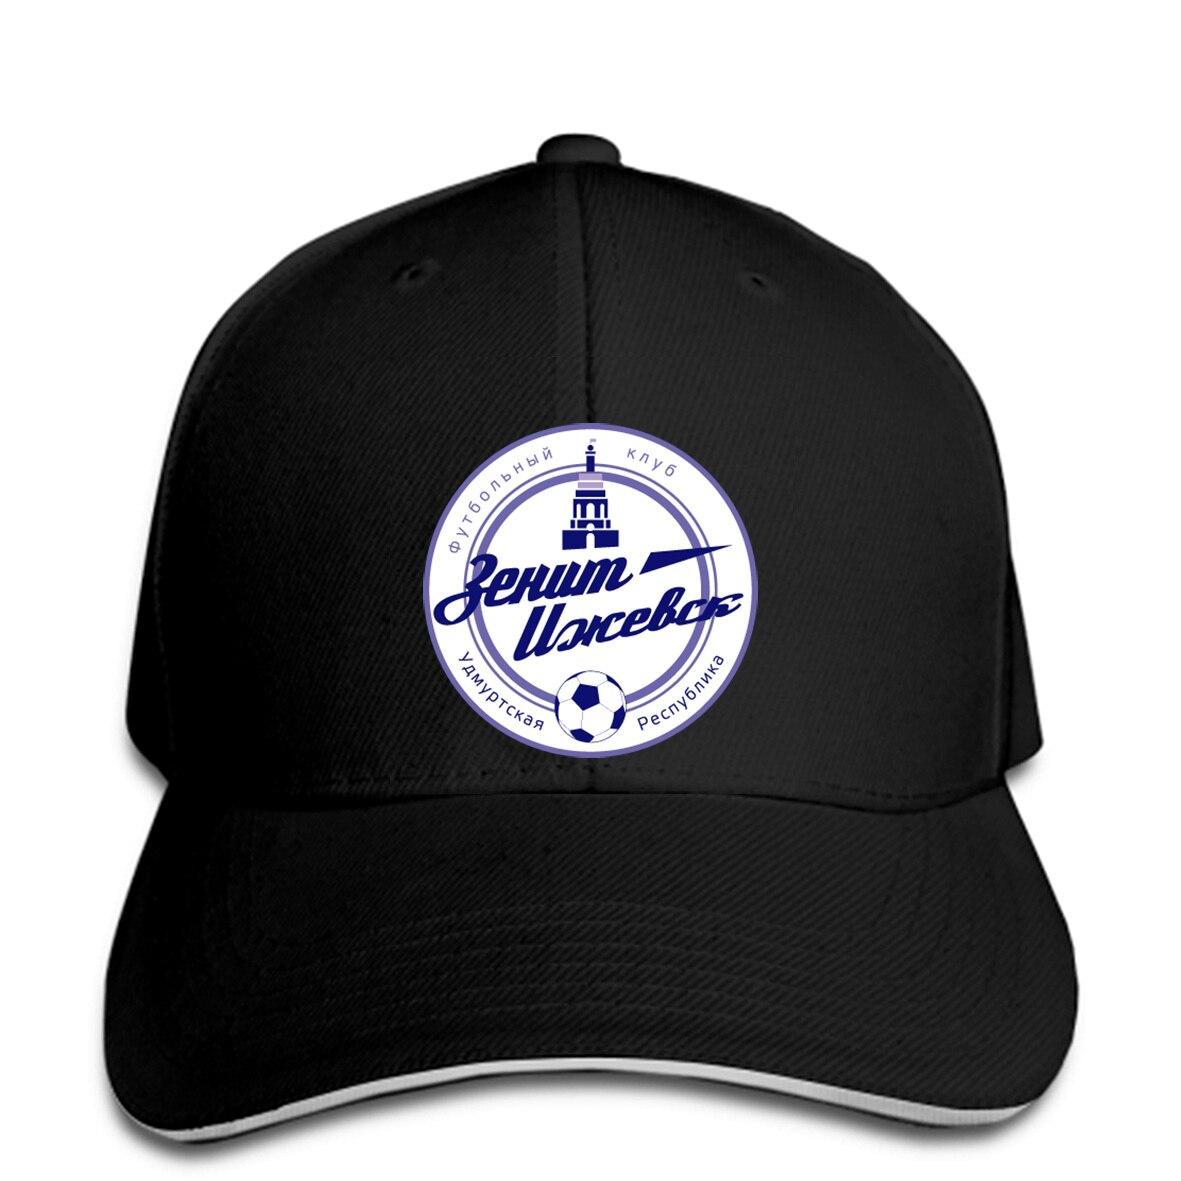 Baseball Cap Logo Fk Zenit Izhevsk Logo Hat Peaked Cap Aliexpress